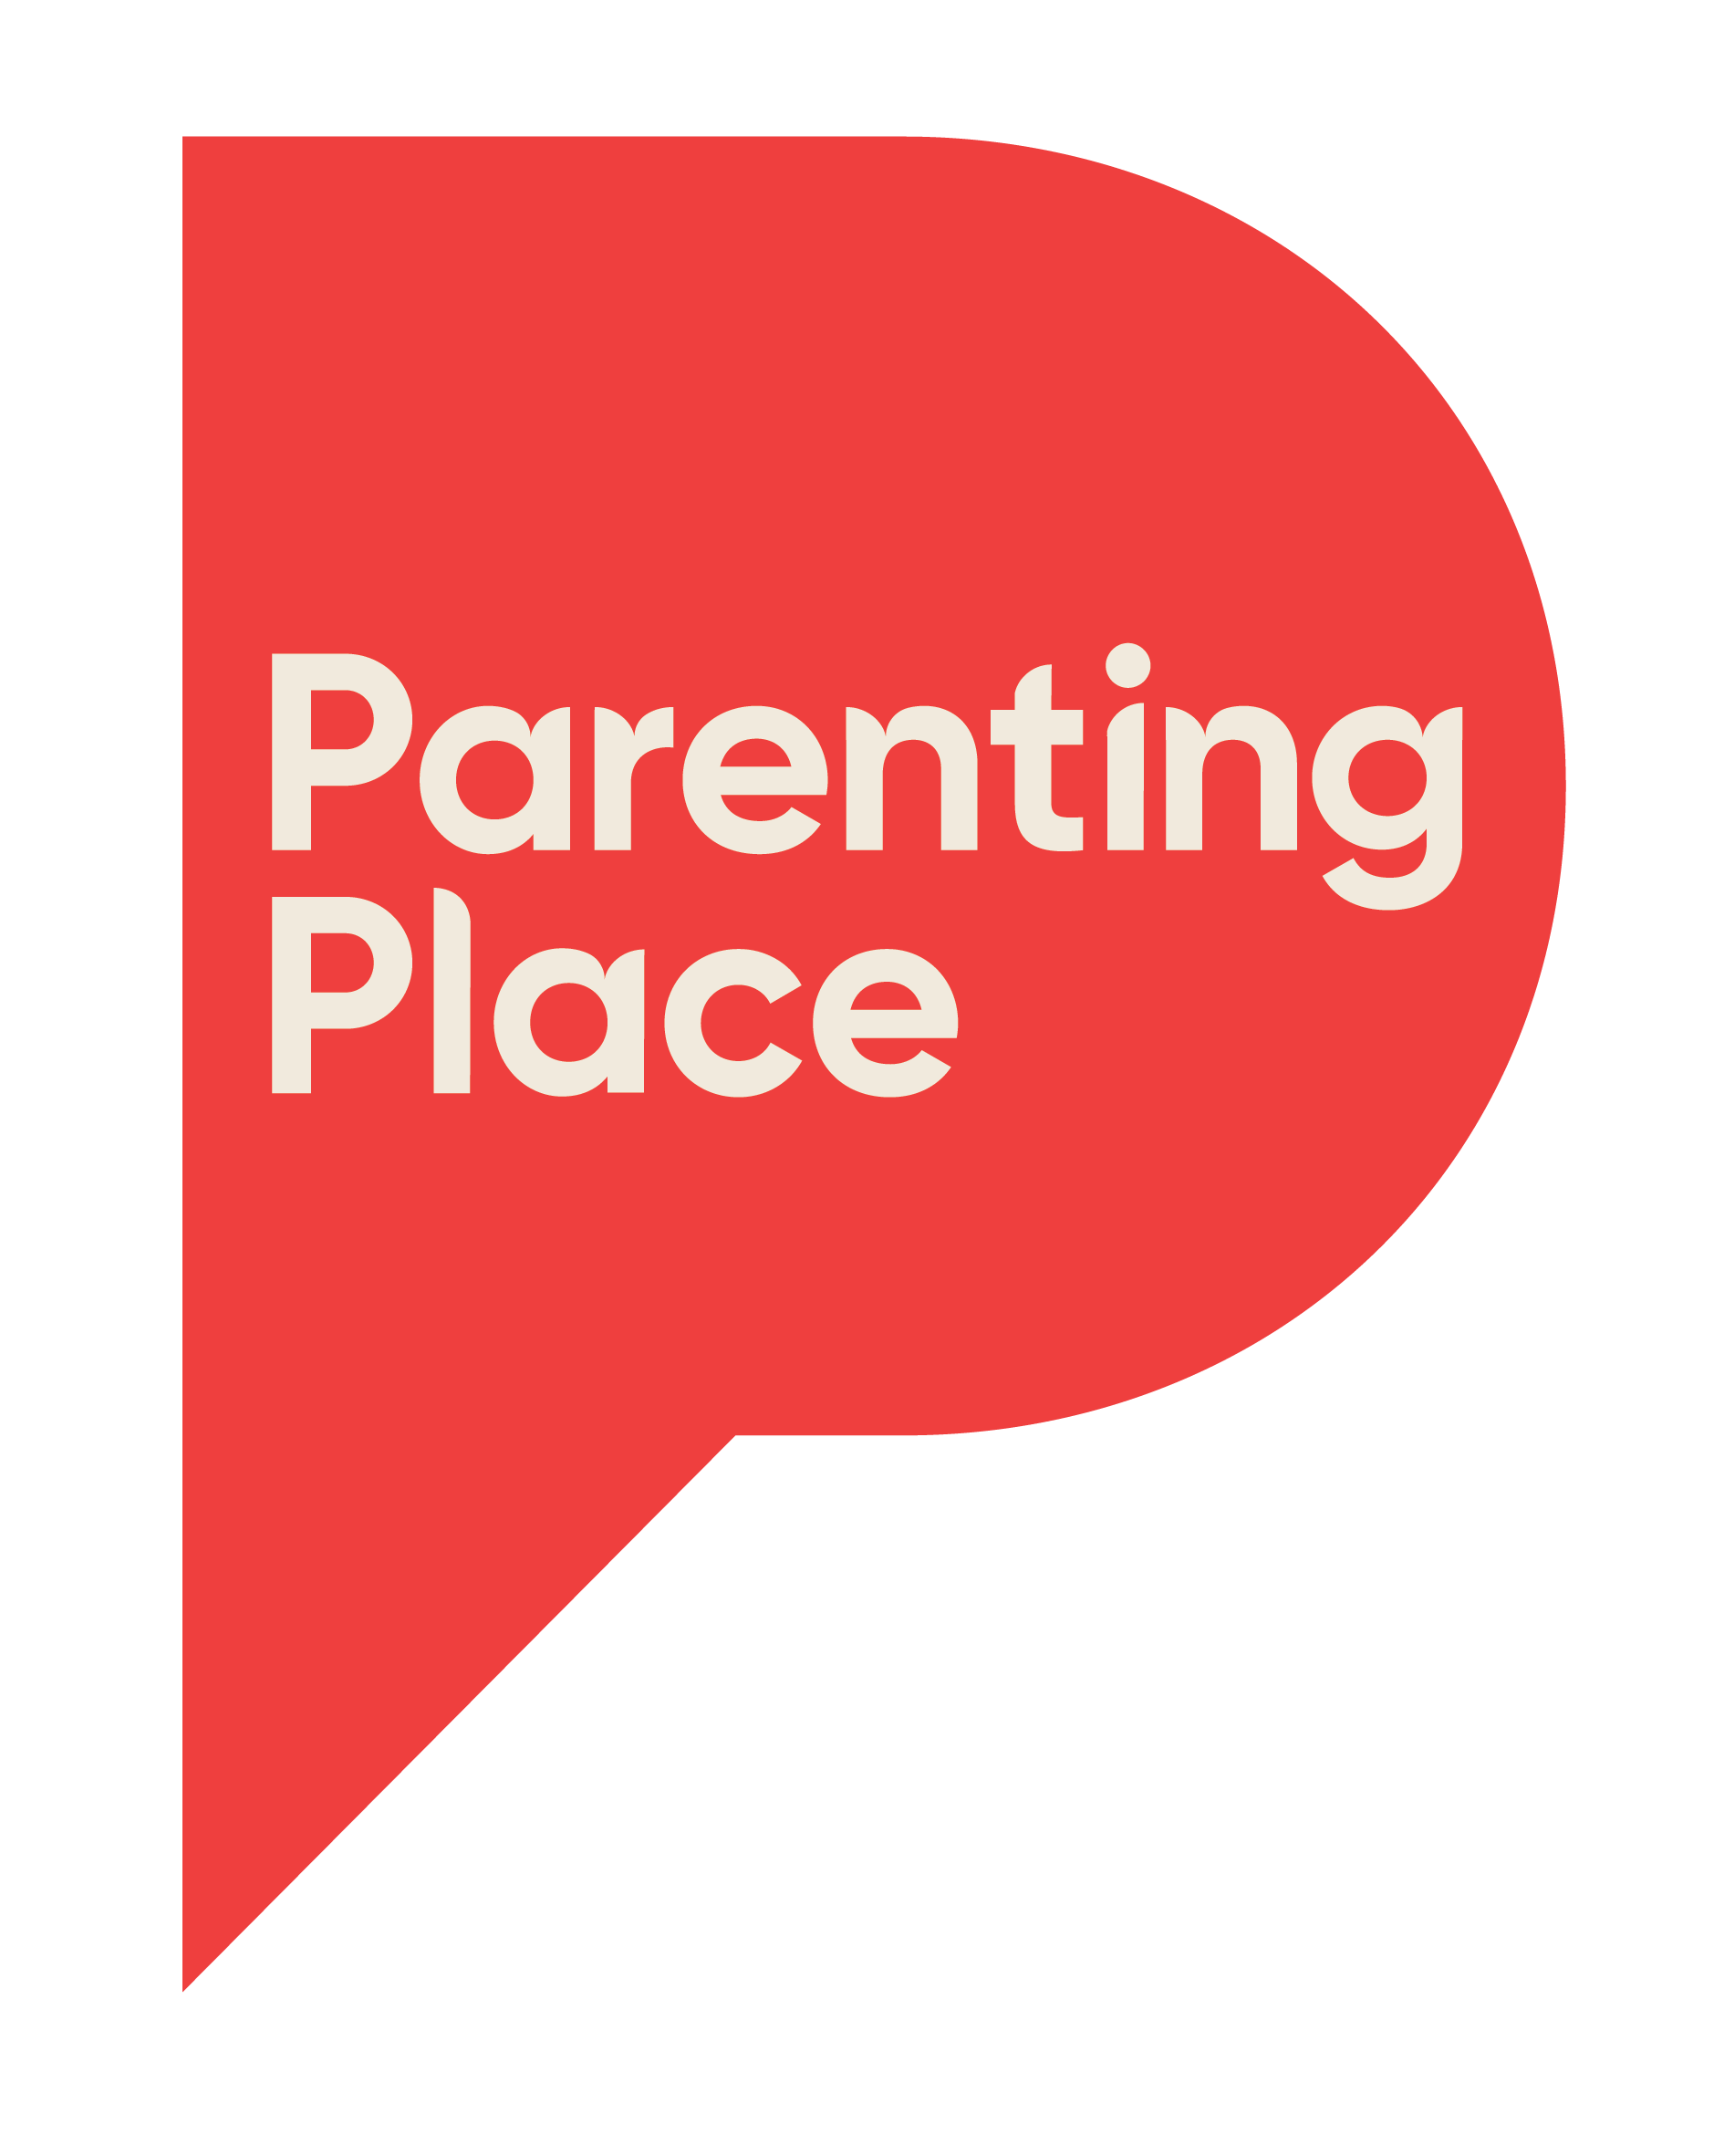 Parenting Place logo